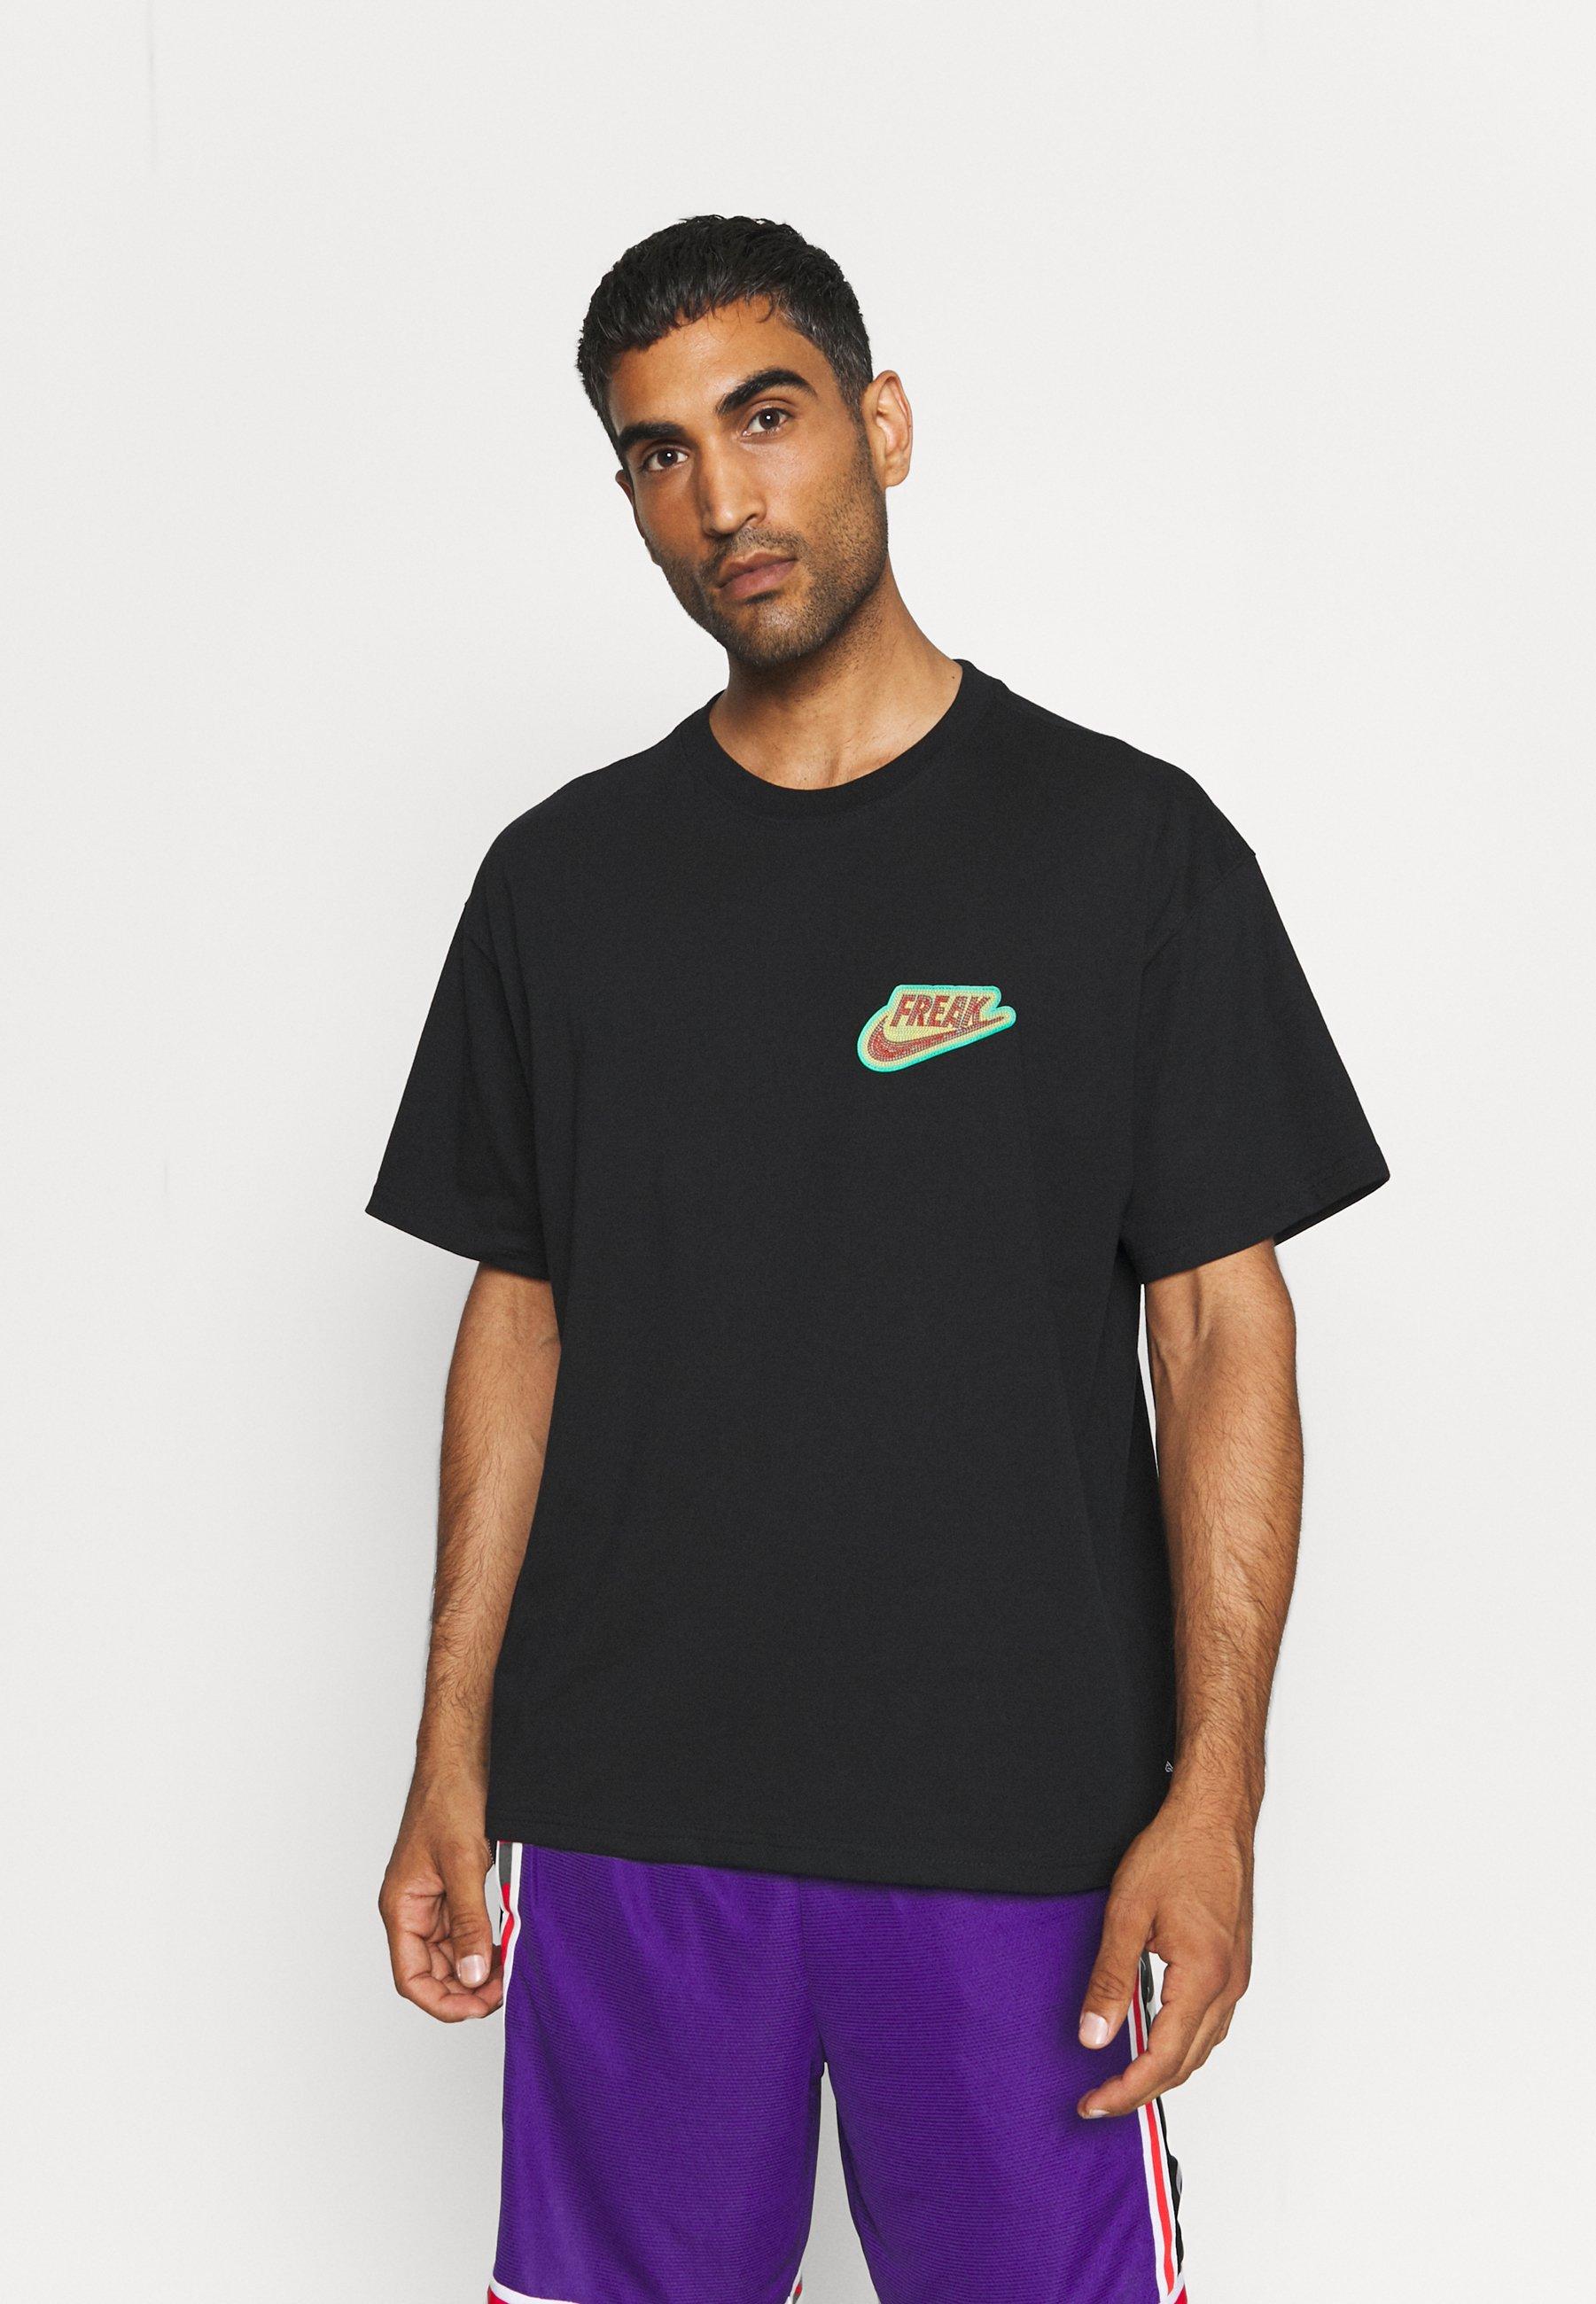 Uomo FREAK TEE - T-shirt con stampa